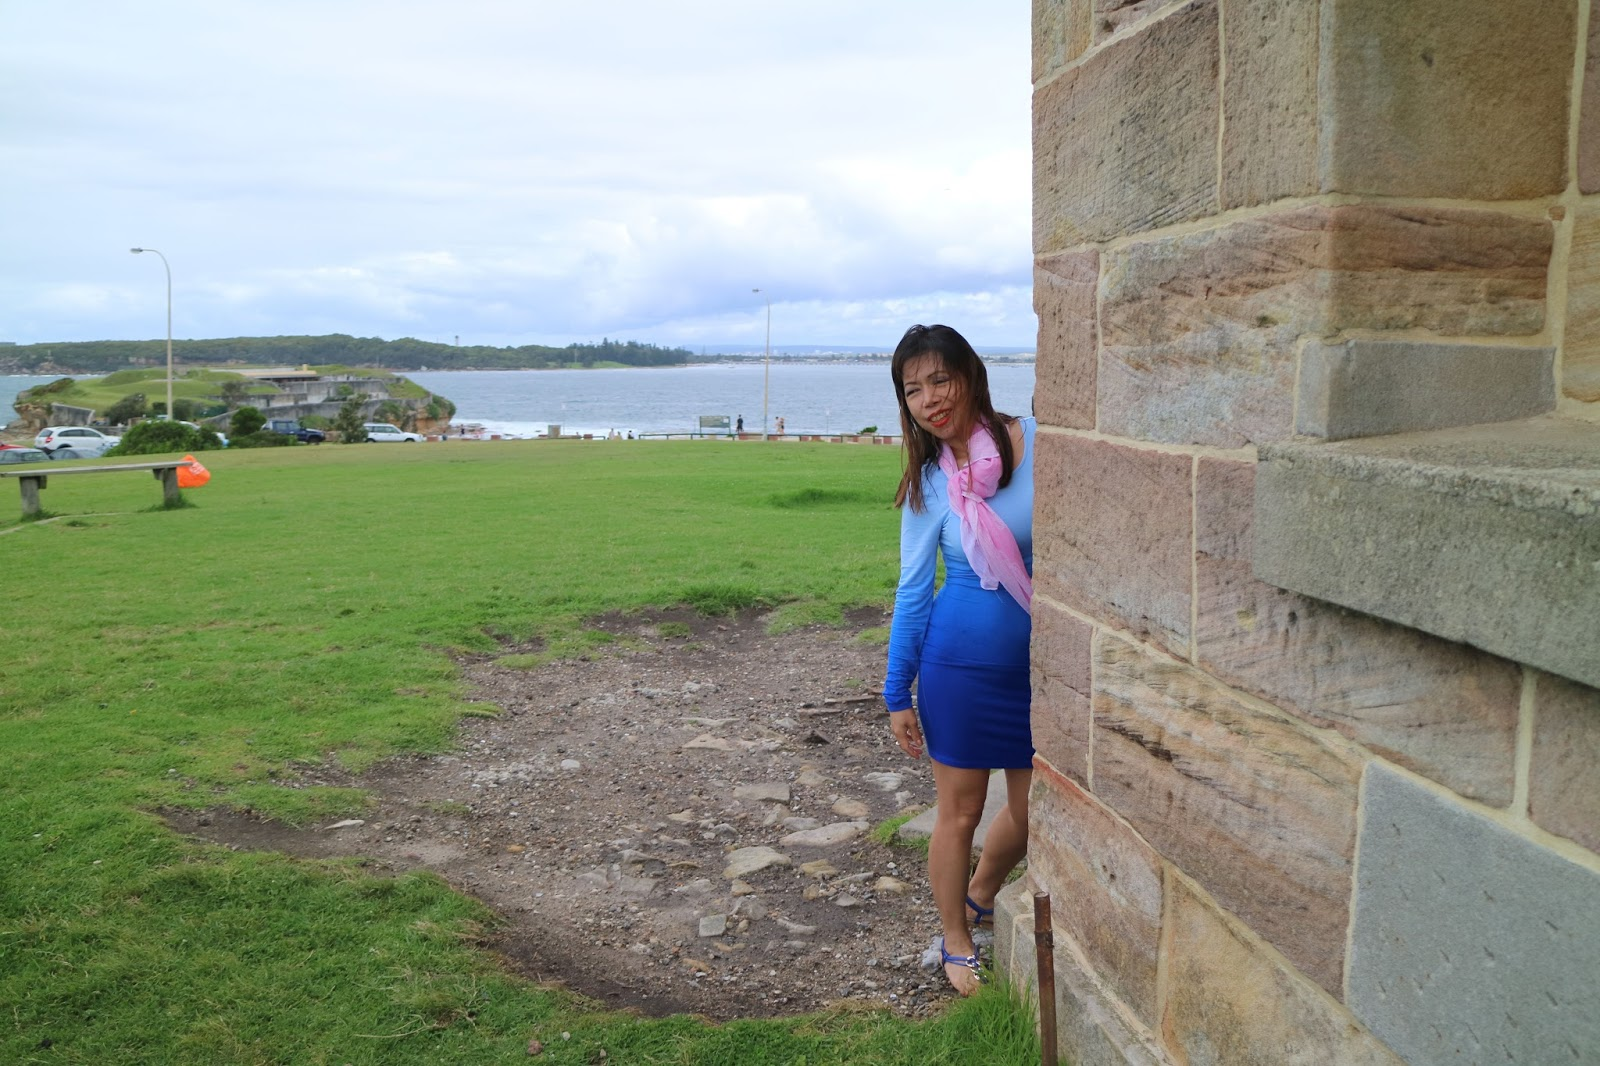 La Perouse Sydney